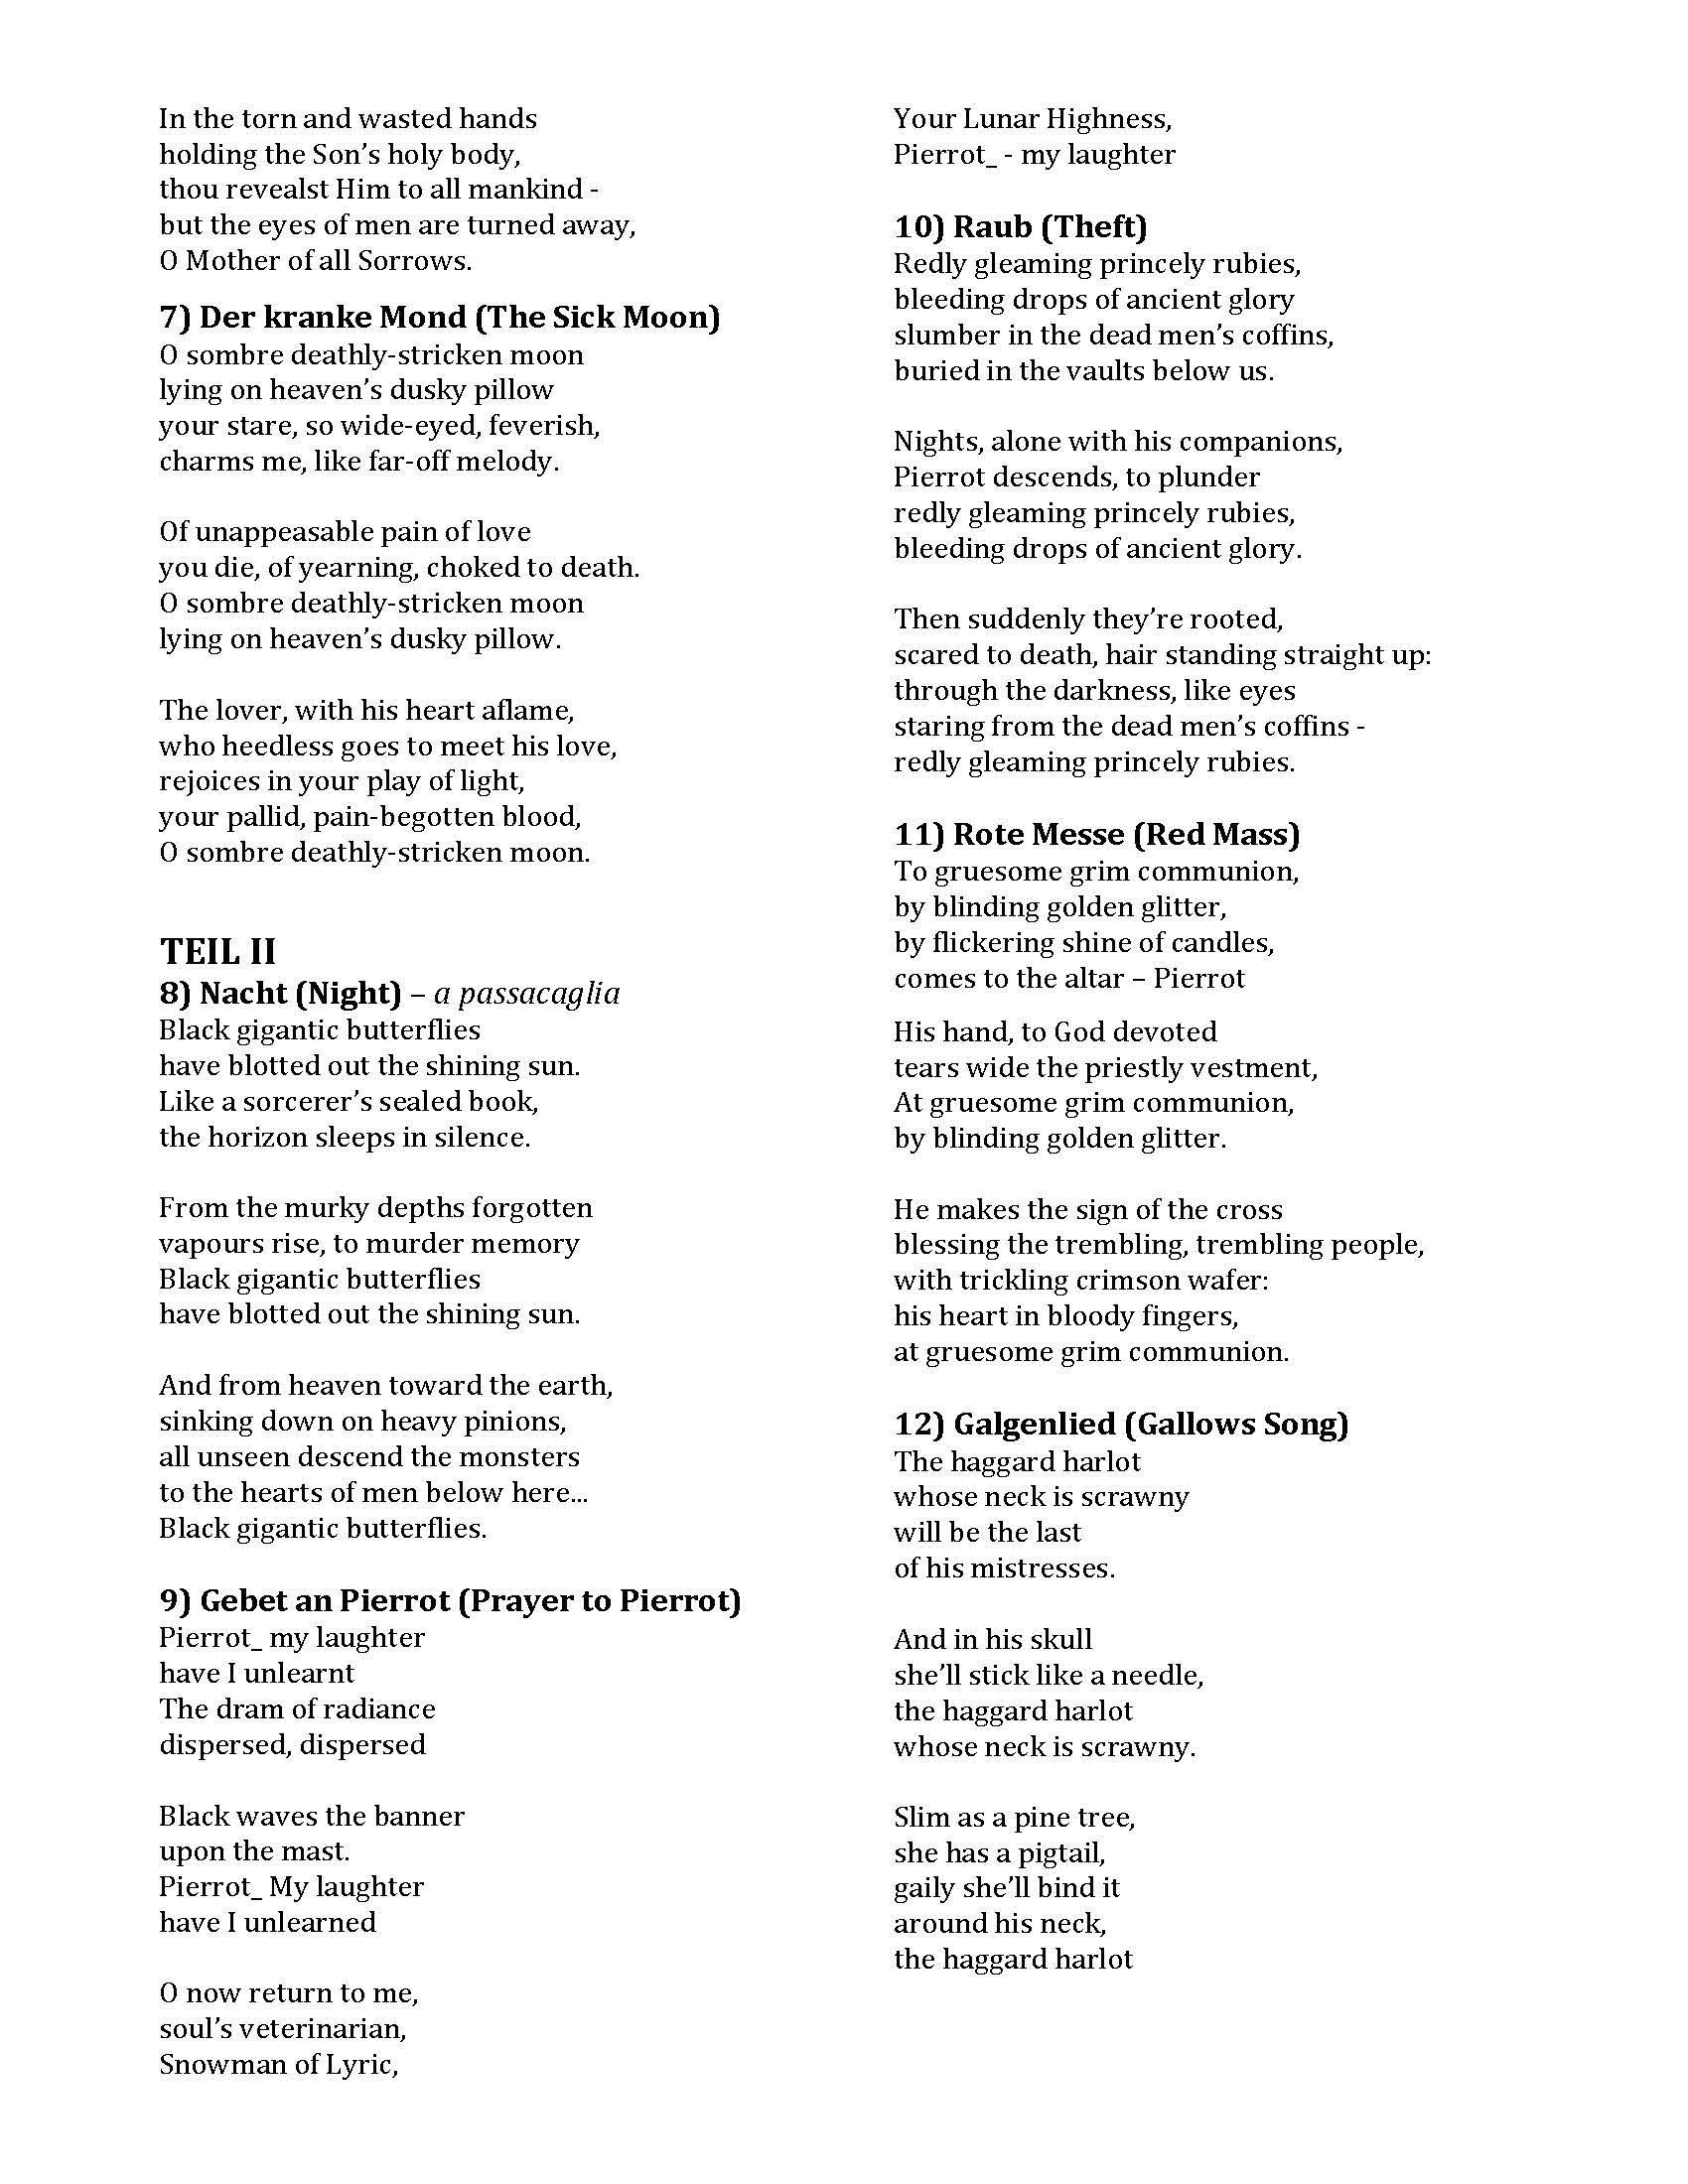 FACULTY CHAMBER MUSIC RECITAL - July 23, 2014 | Interlochen